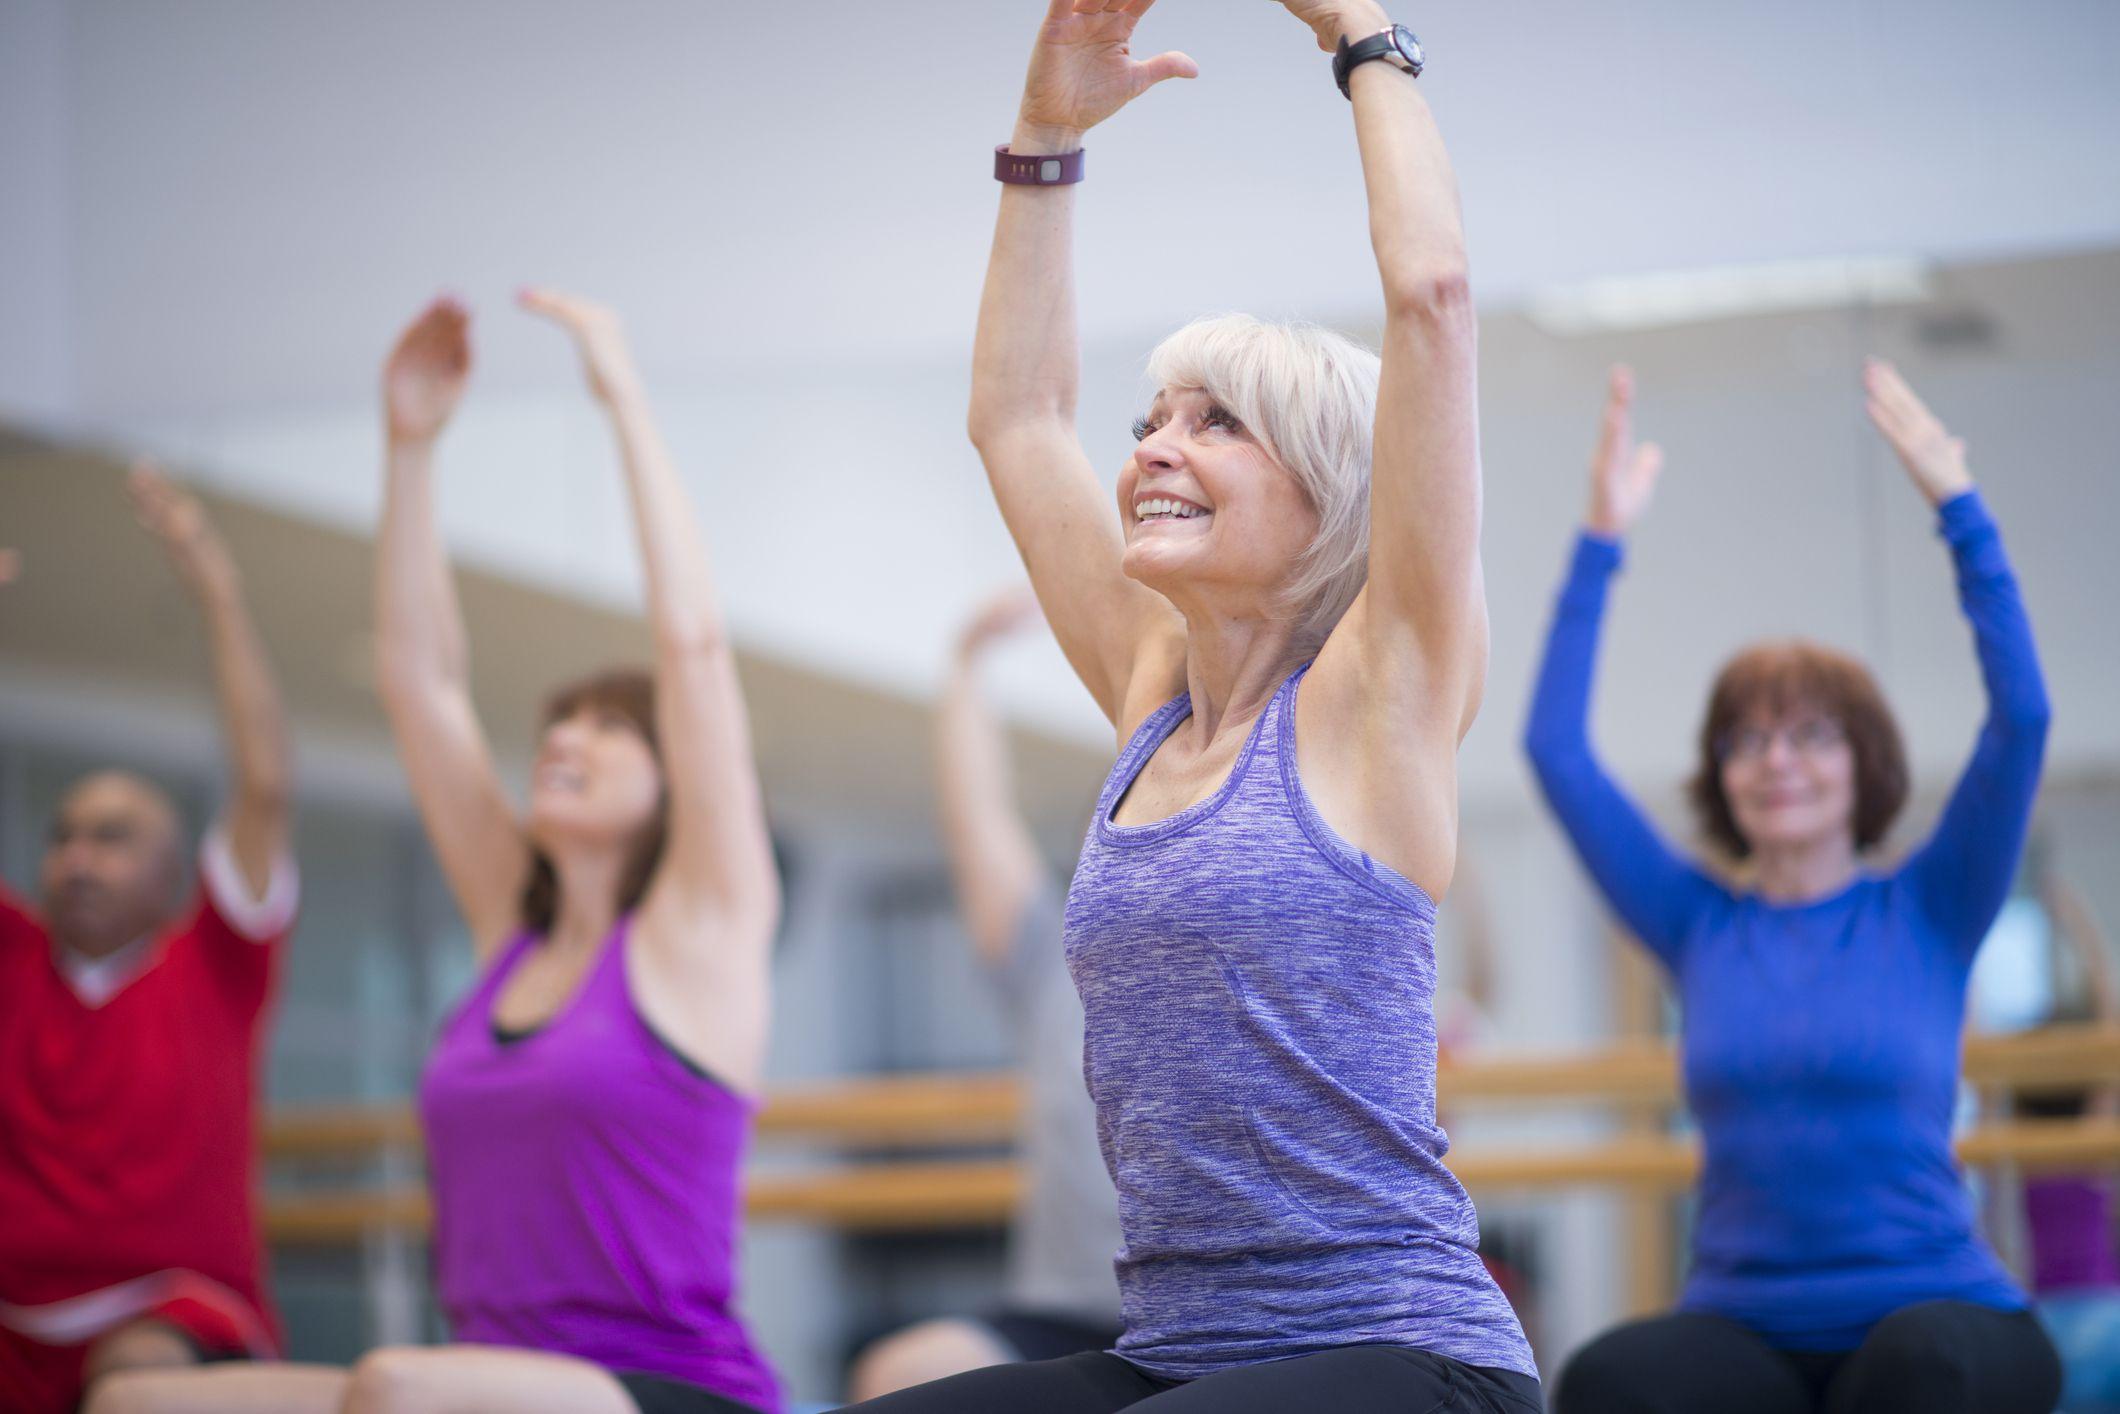 Best Ways to Make Exercise Fun